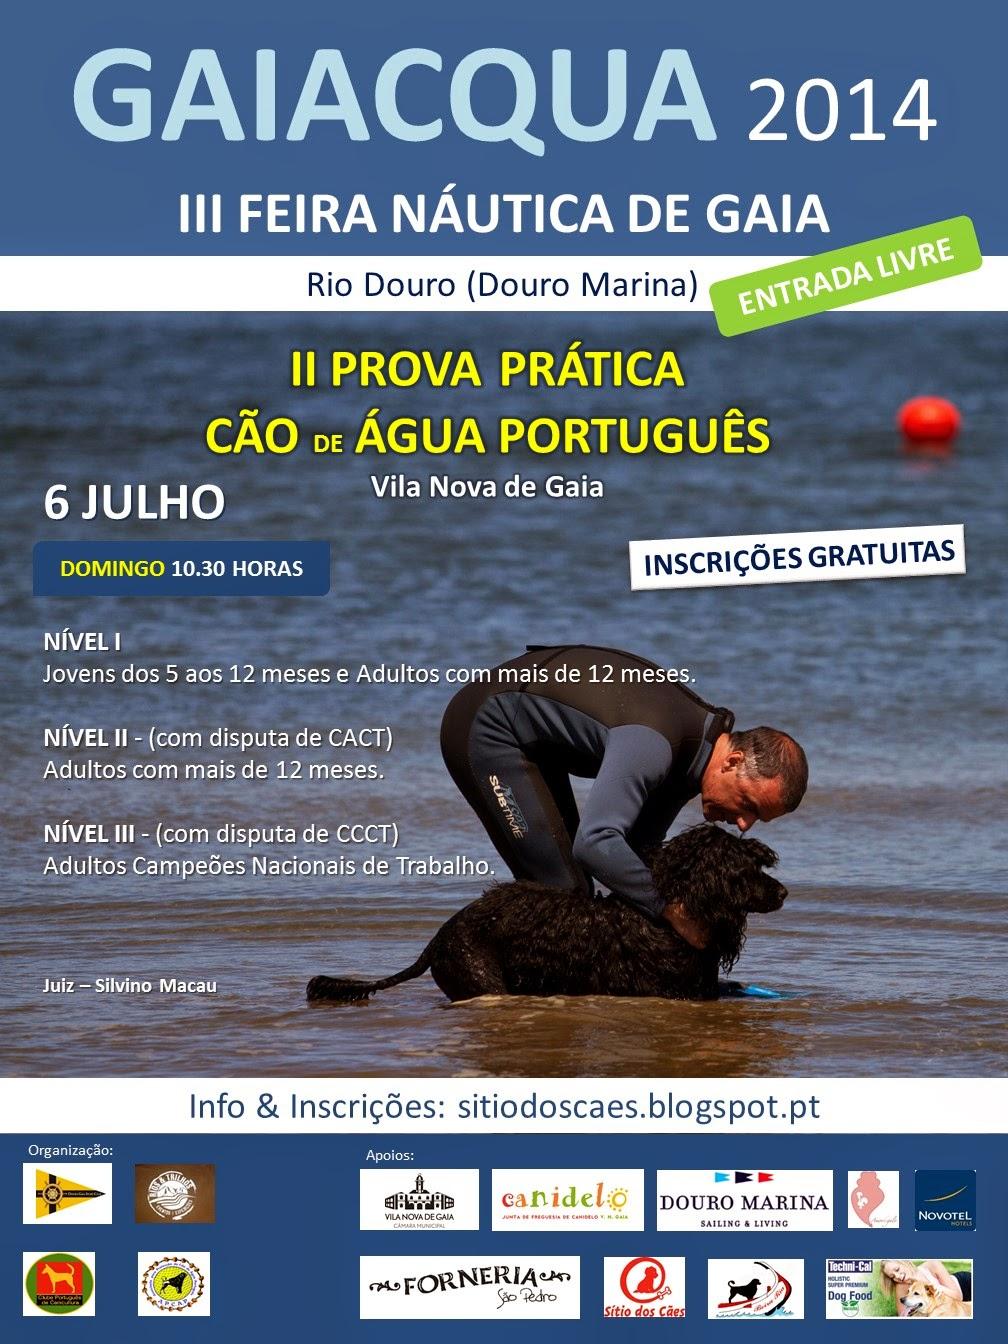 http://sitiodoscaes.blogspot.pt/p/ii-prova-pratica-para-cao-de-agua.html